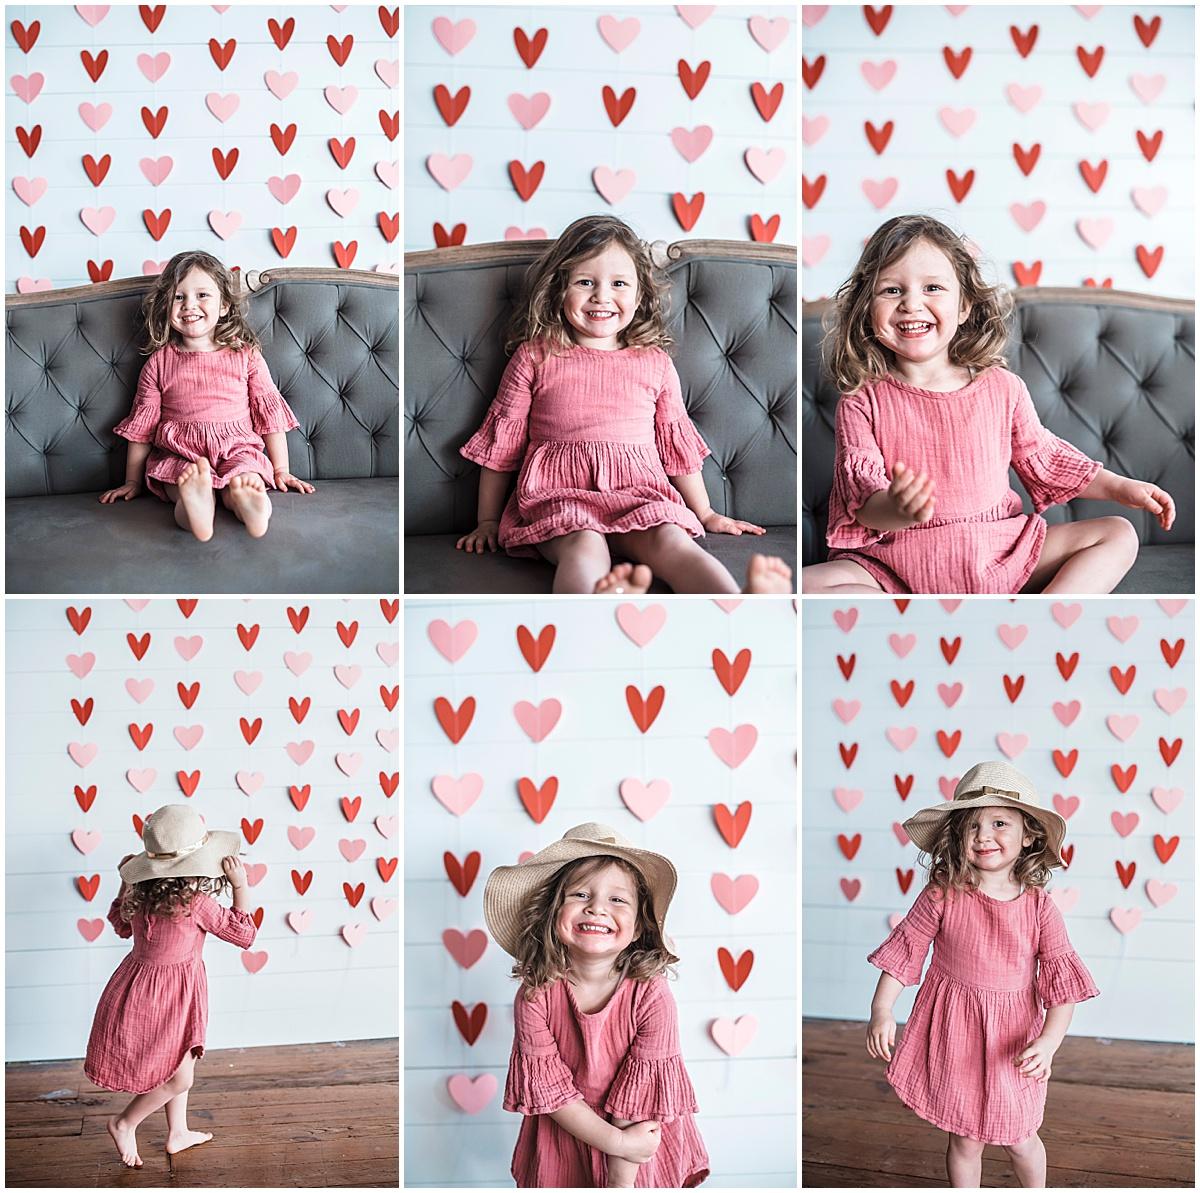 Valentine's day mini photo sessions